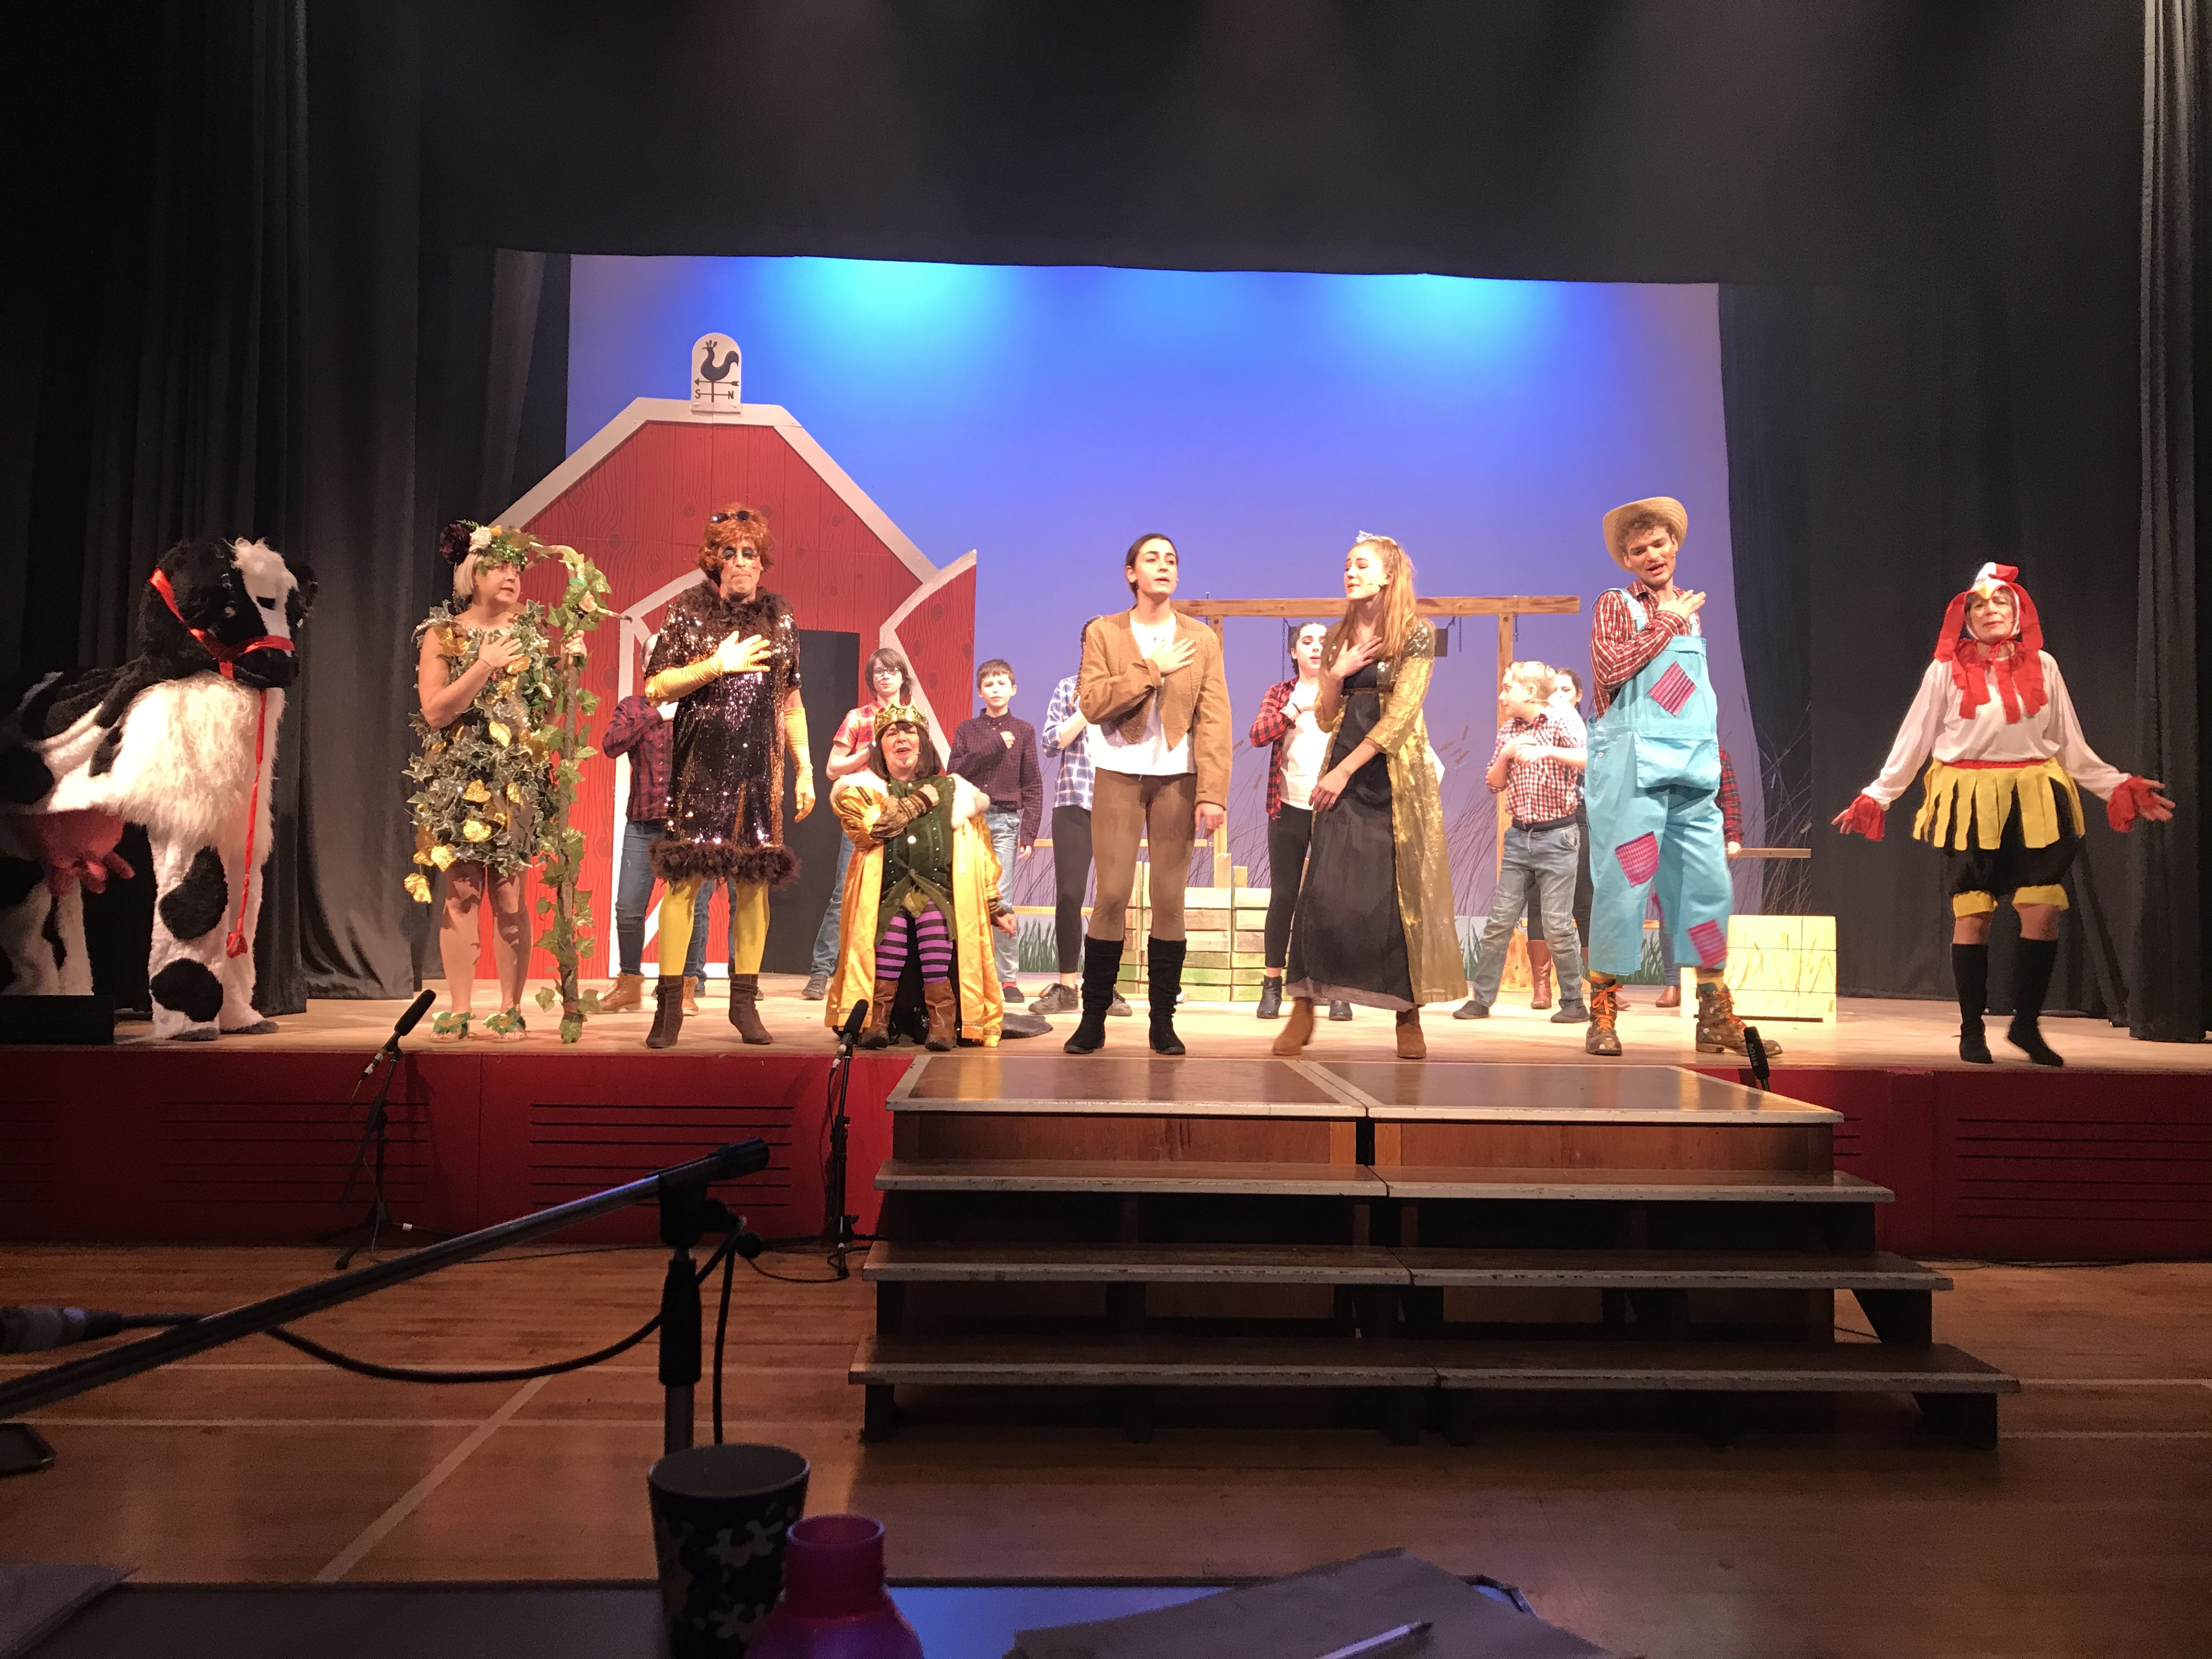 CADS Snow White Auditions @ King James Academy Senior Site, Drama Studio | England | United Kingdom